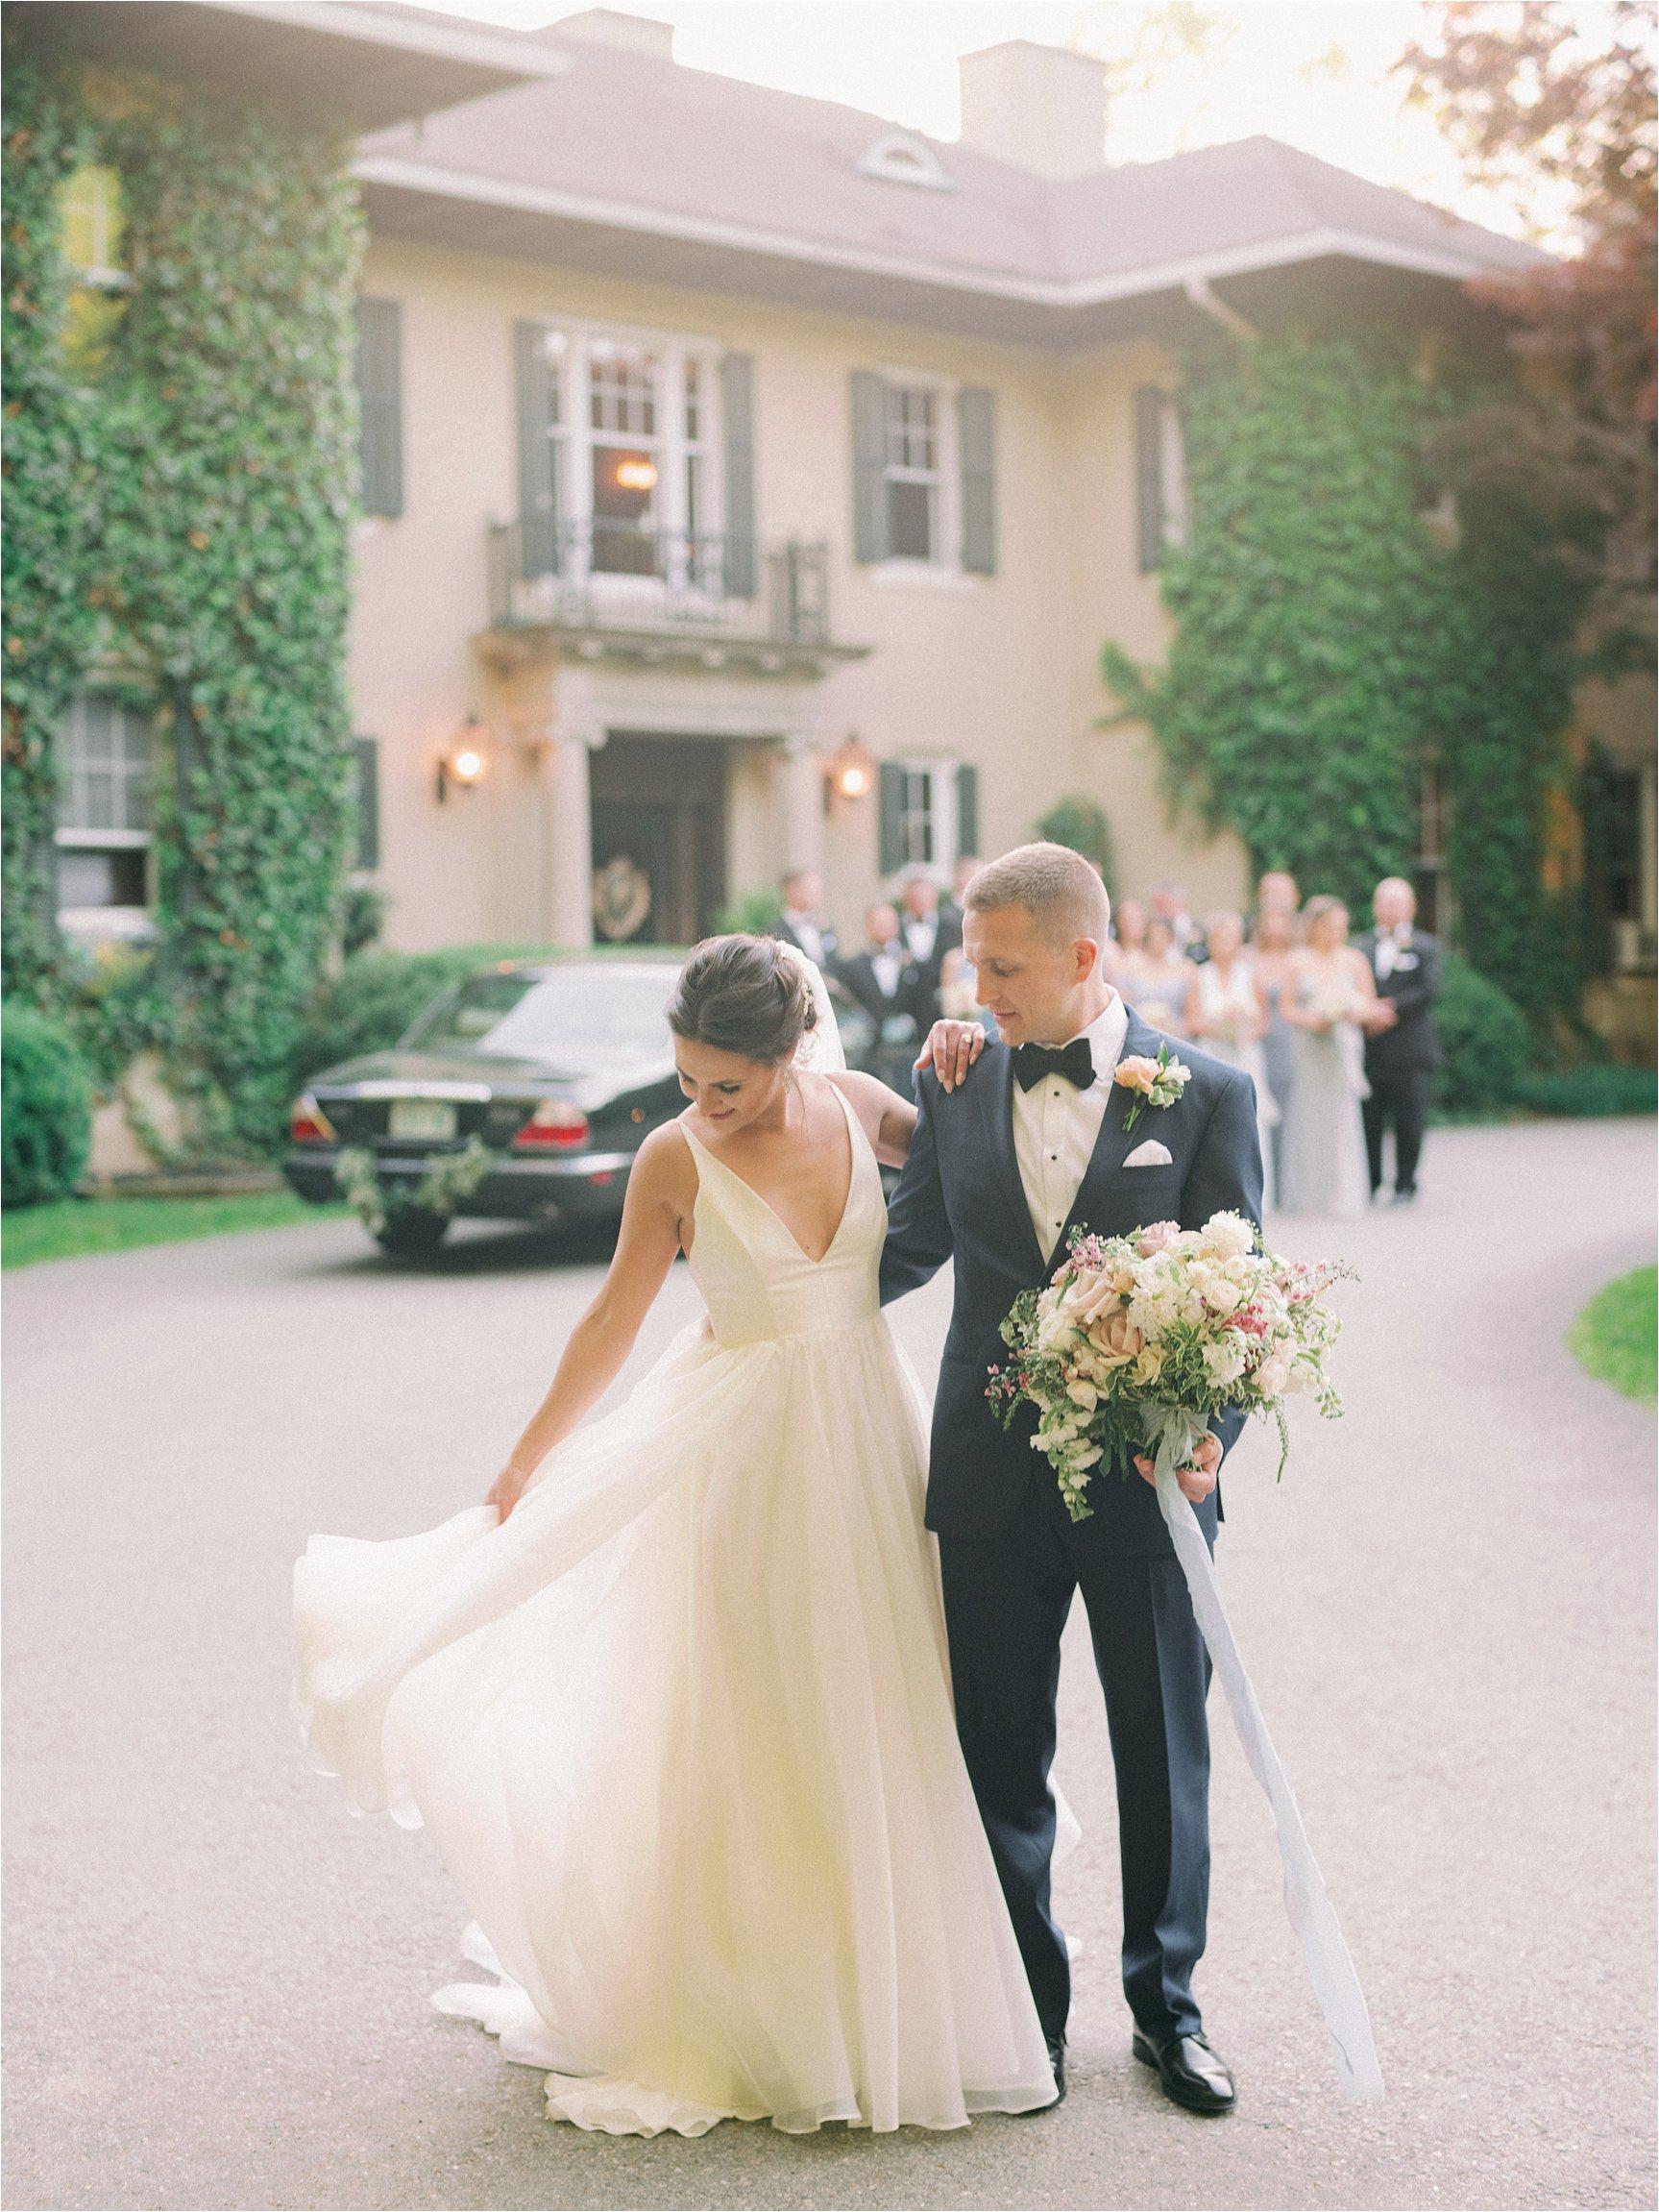 Lord_Thompson_Manor_Wedding099.JPG